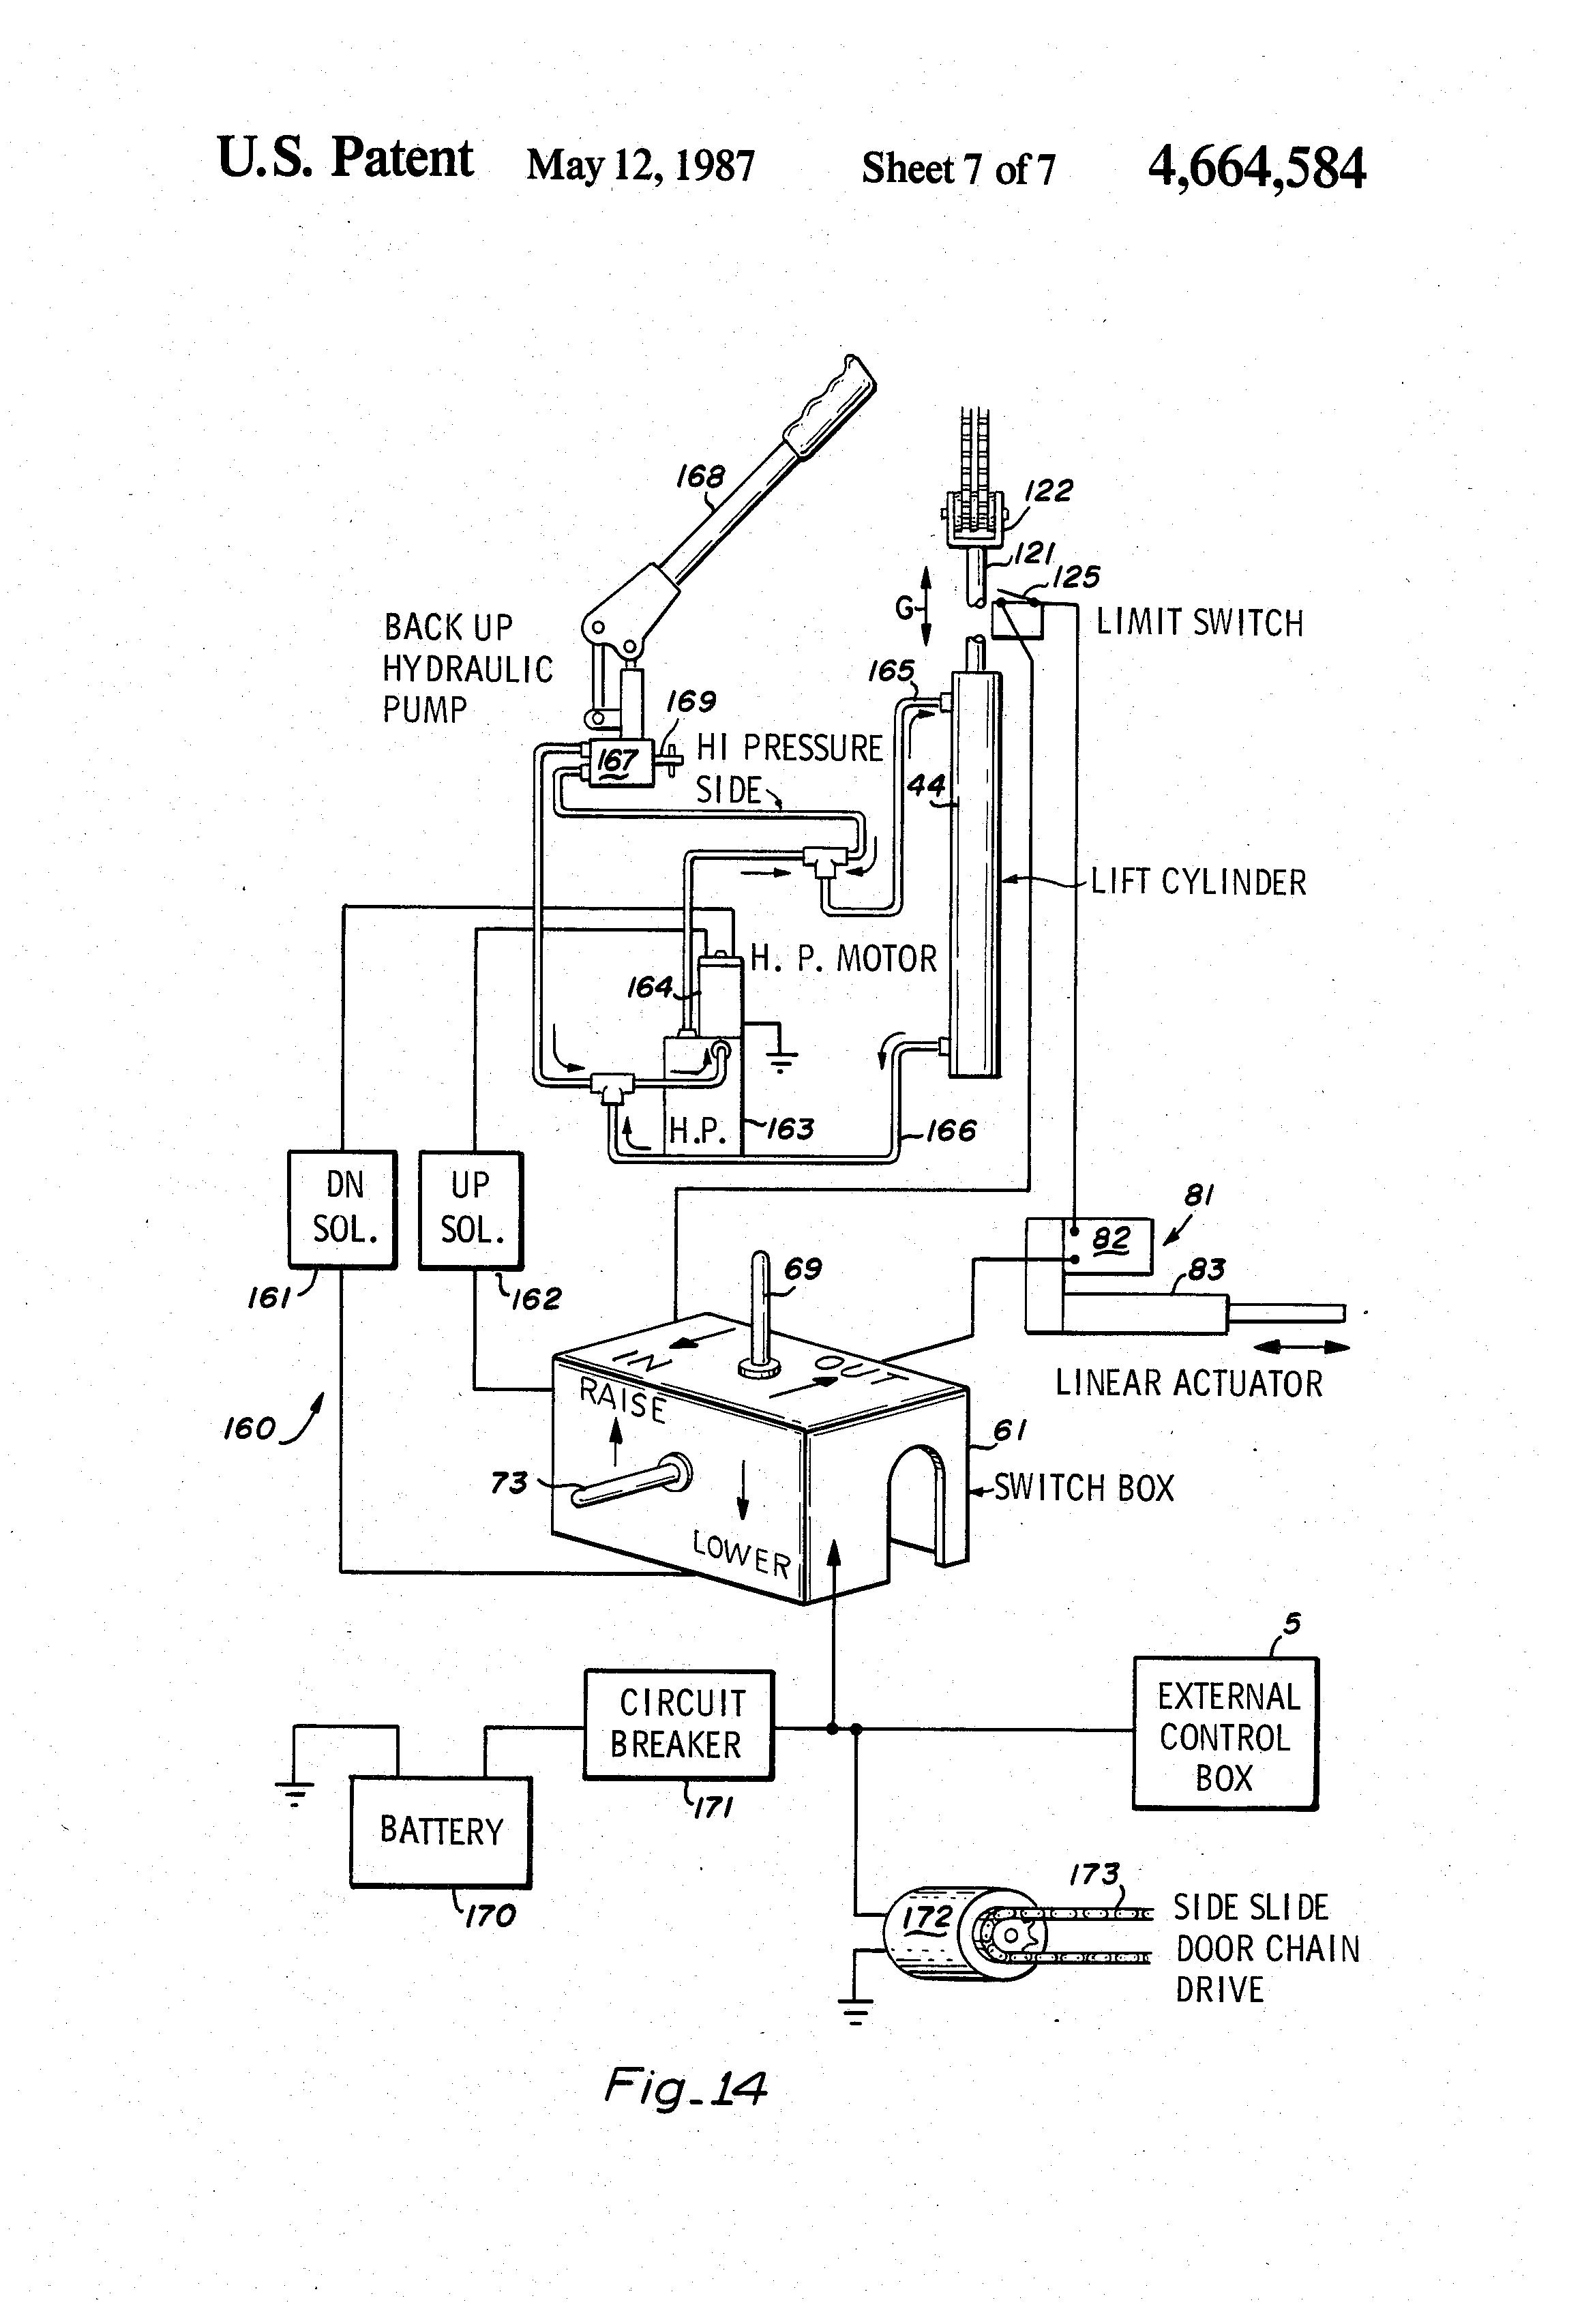 kubota tractor wiring diagrams opc wg 5135  solenoid wiring diagram besides kubota electrical wiring  solenoid wiring diagram besides kubota